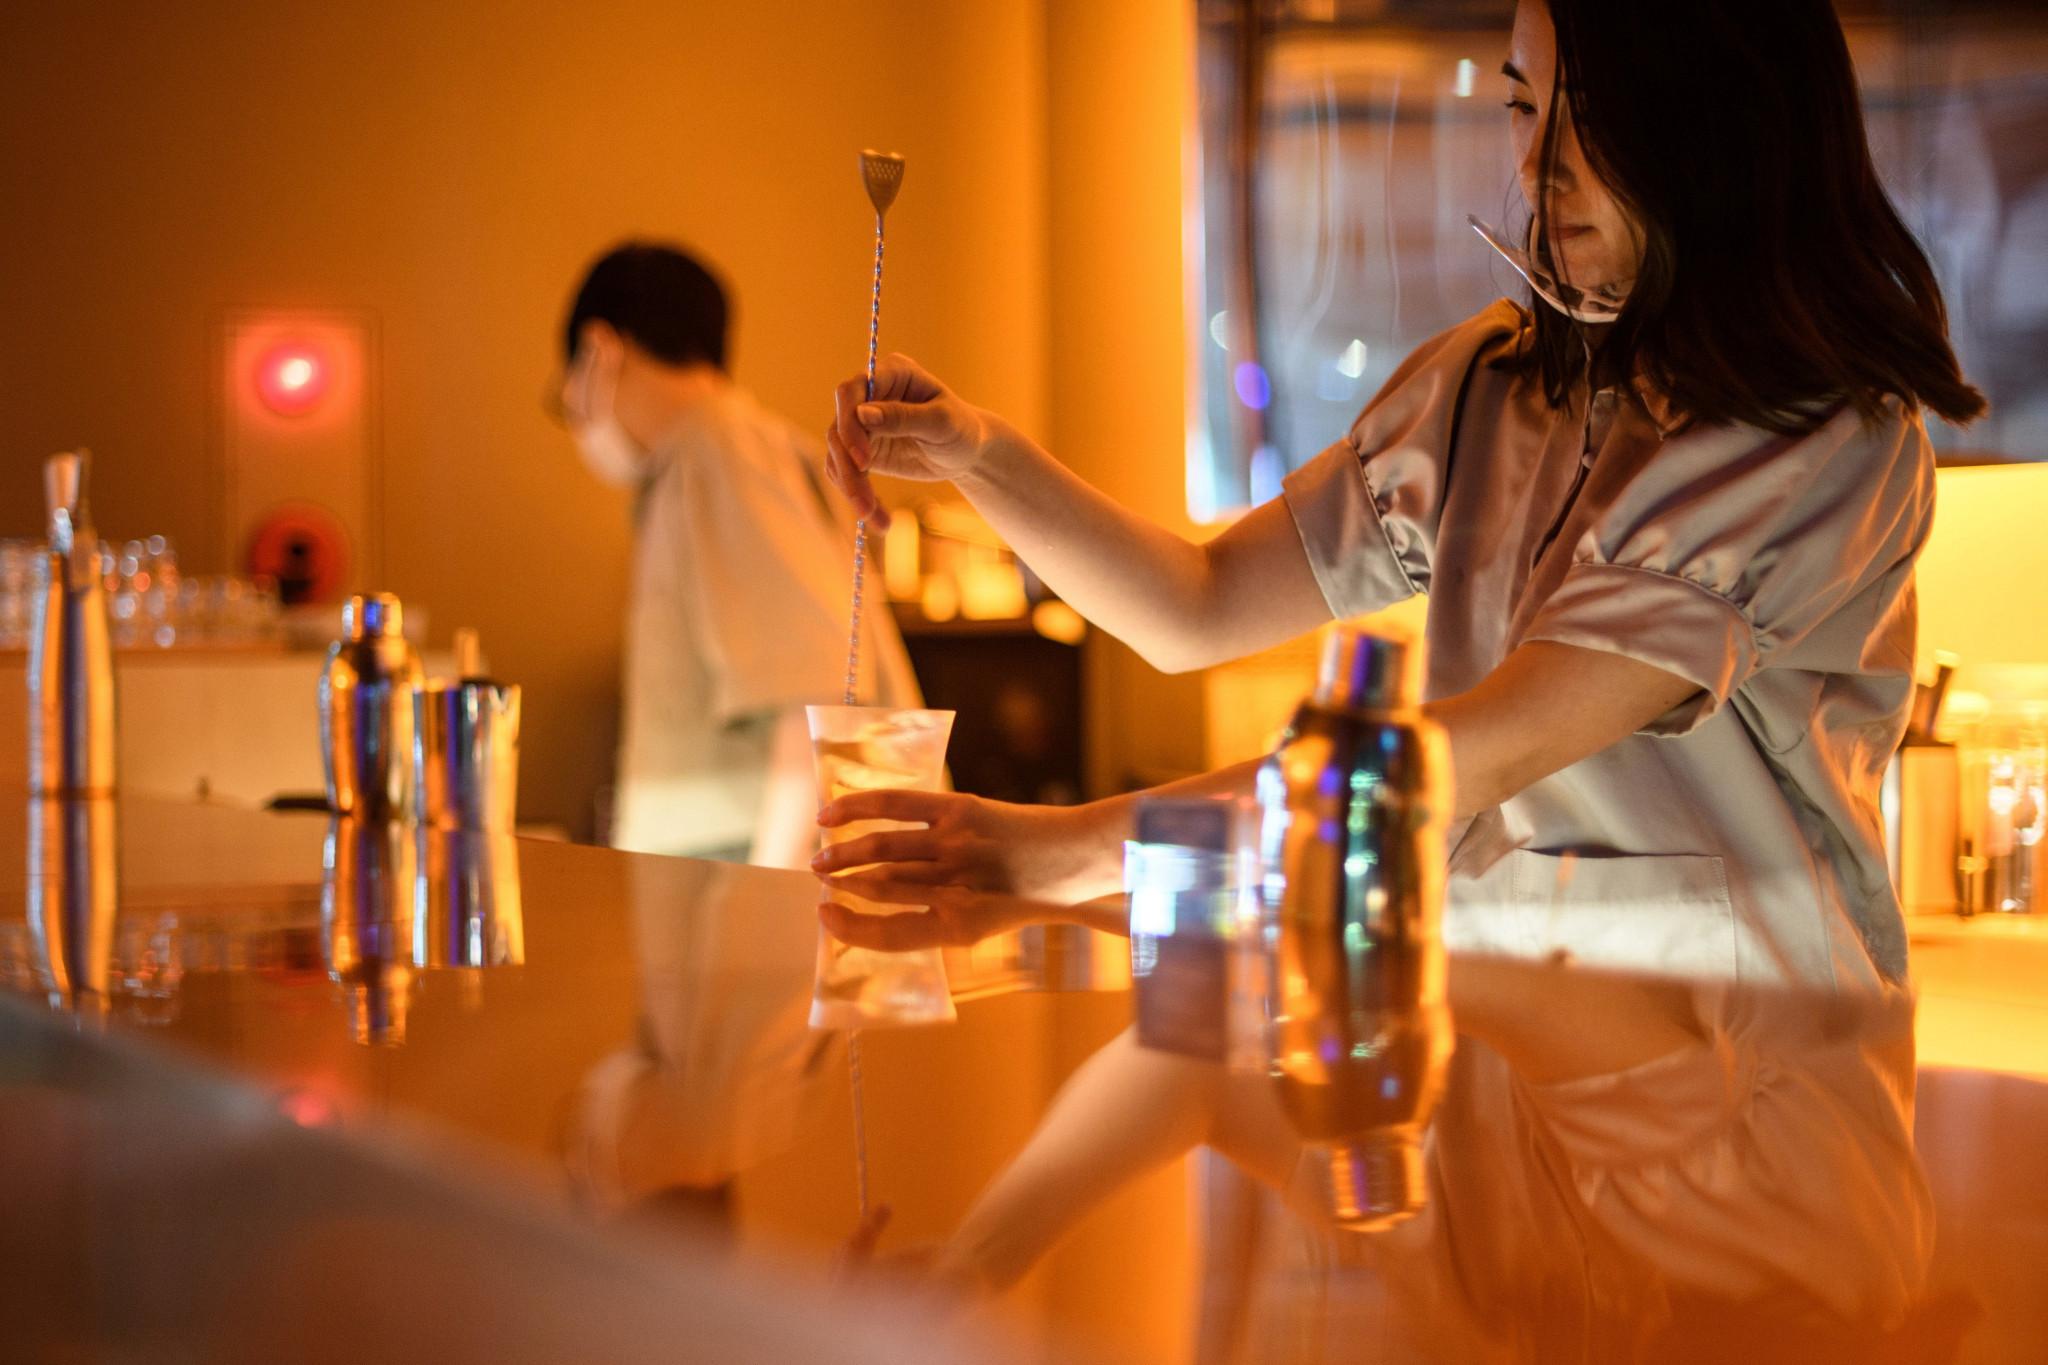 Tokyo 2020 confirm alcohol ban at Olympics after U-turn